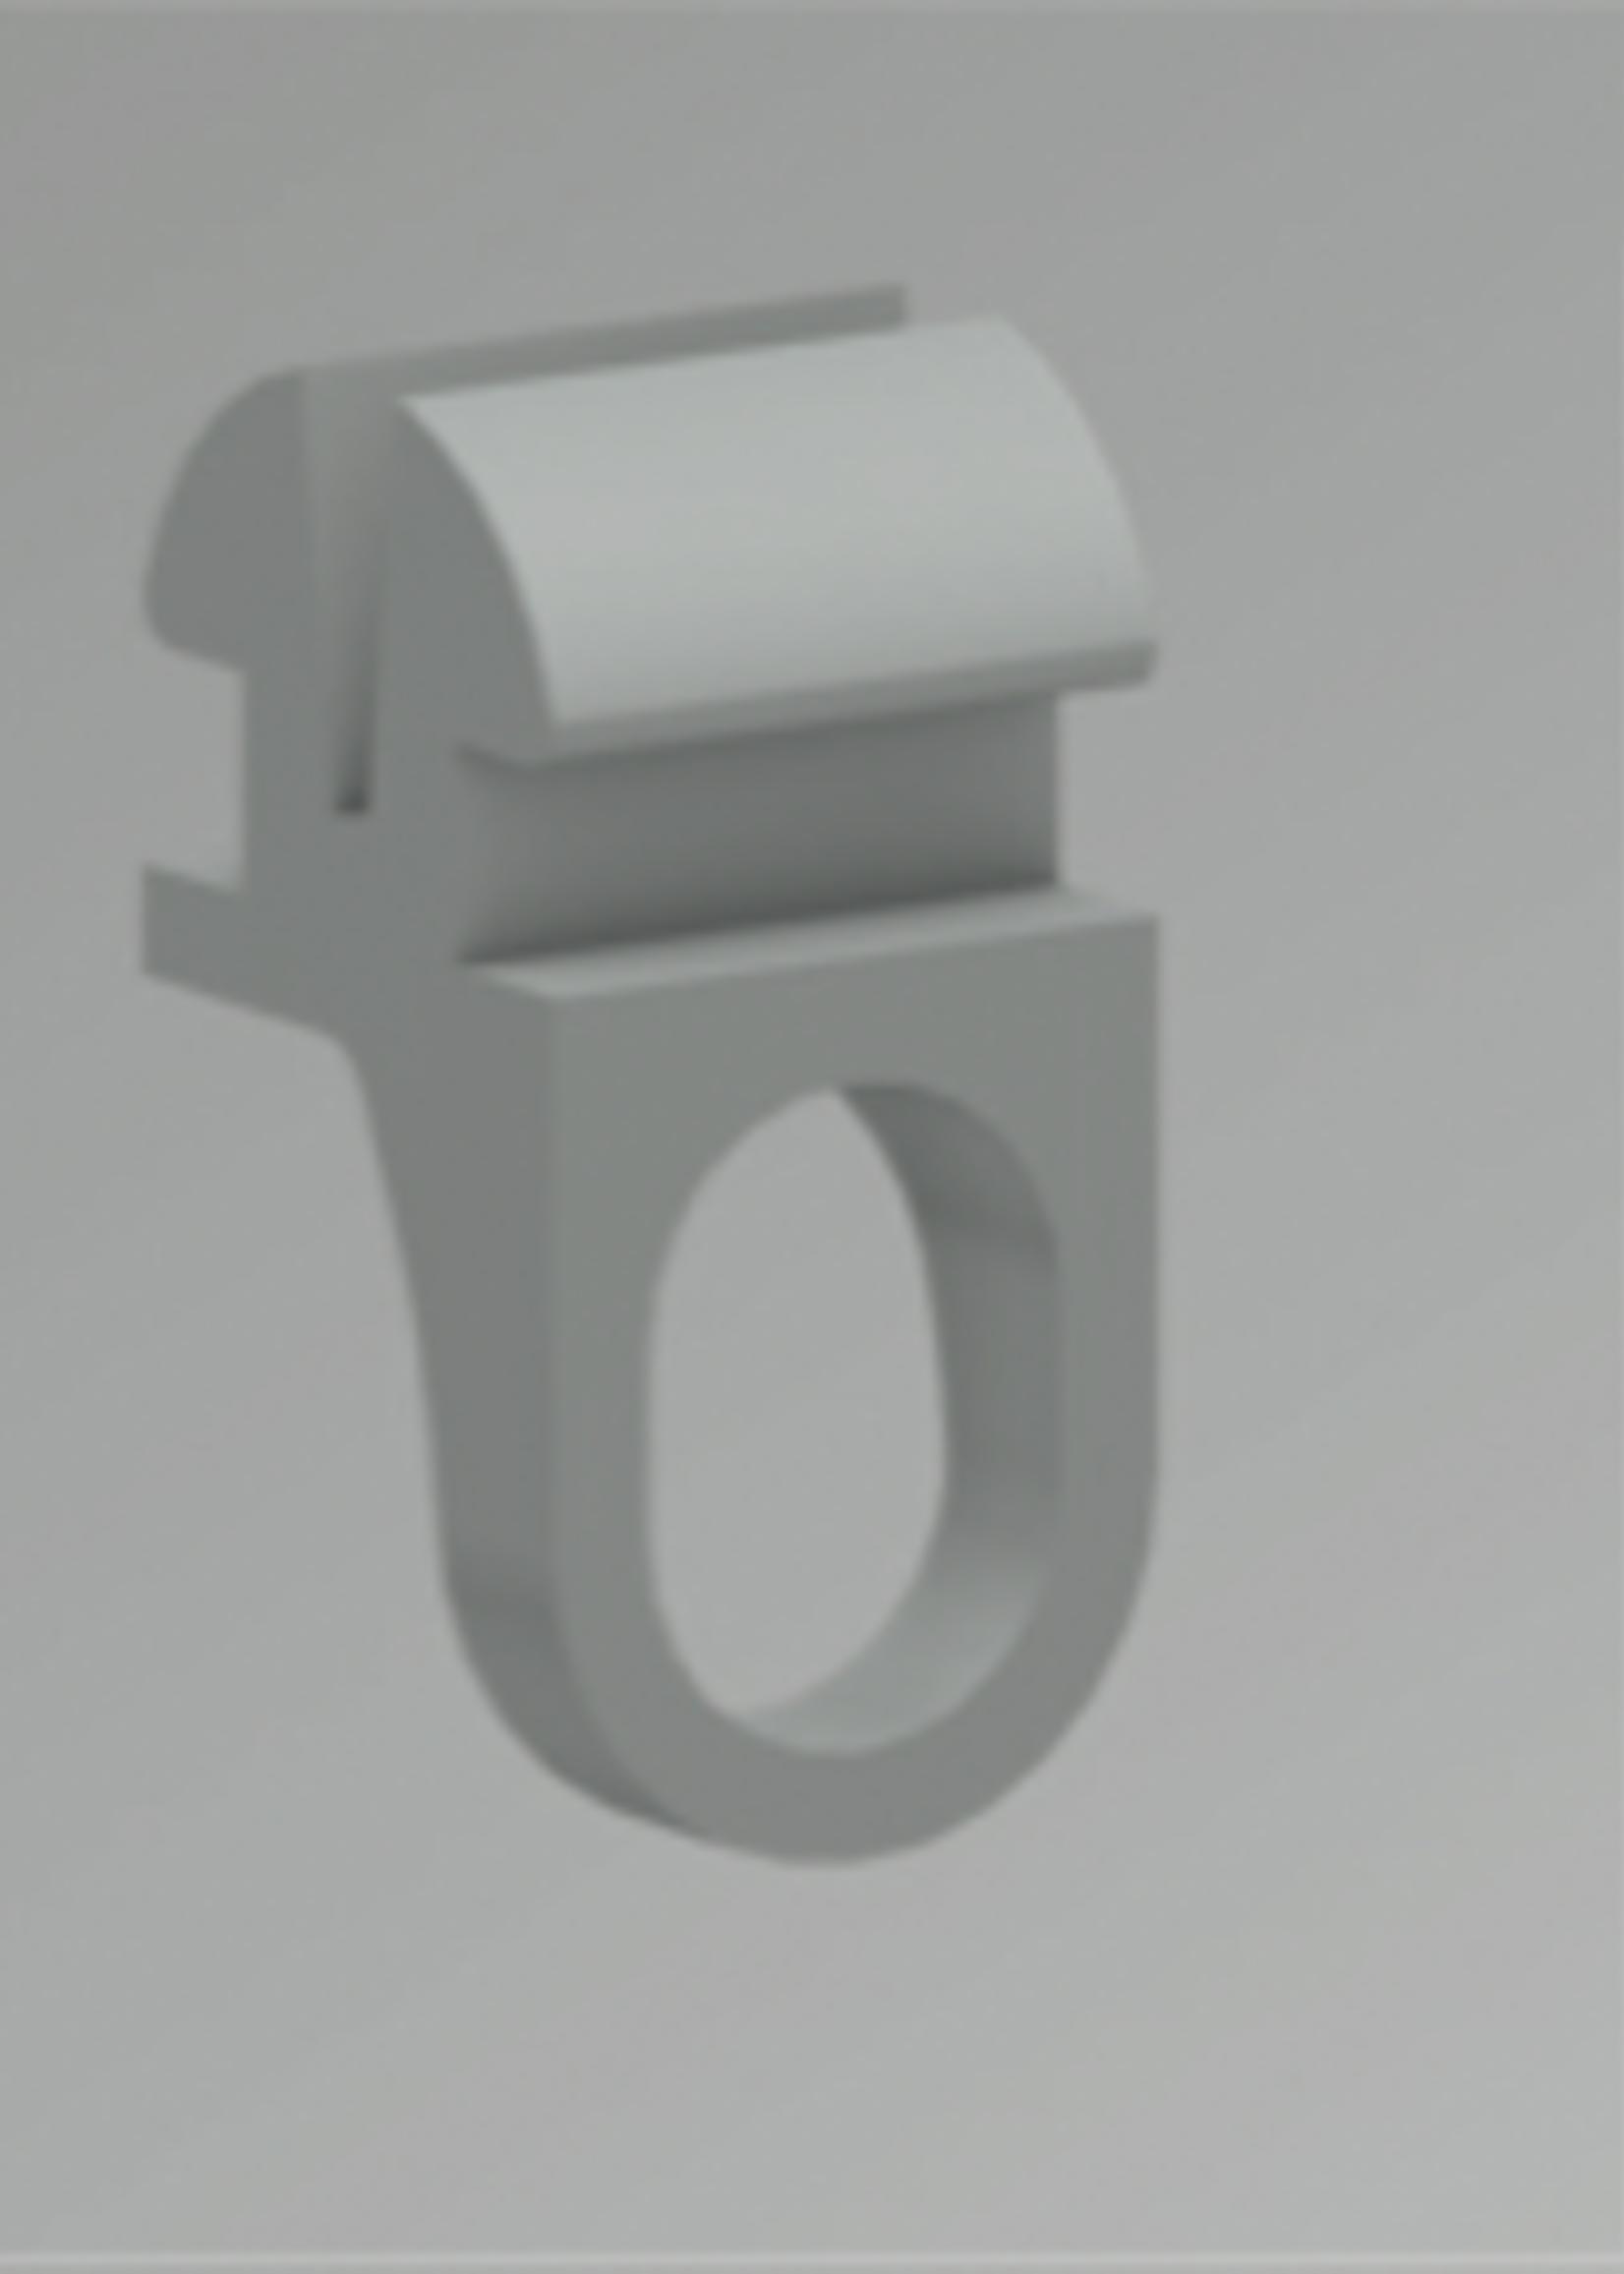 Gordijn Glijder U-Rails (KS) verpakt per 20 stuks